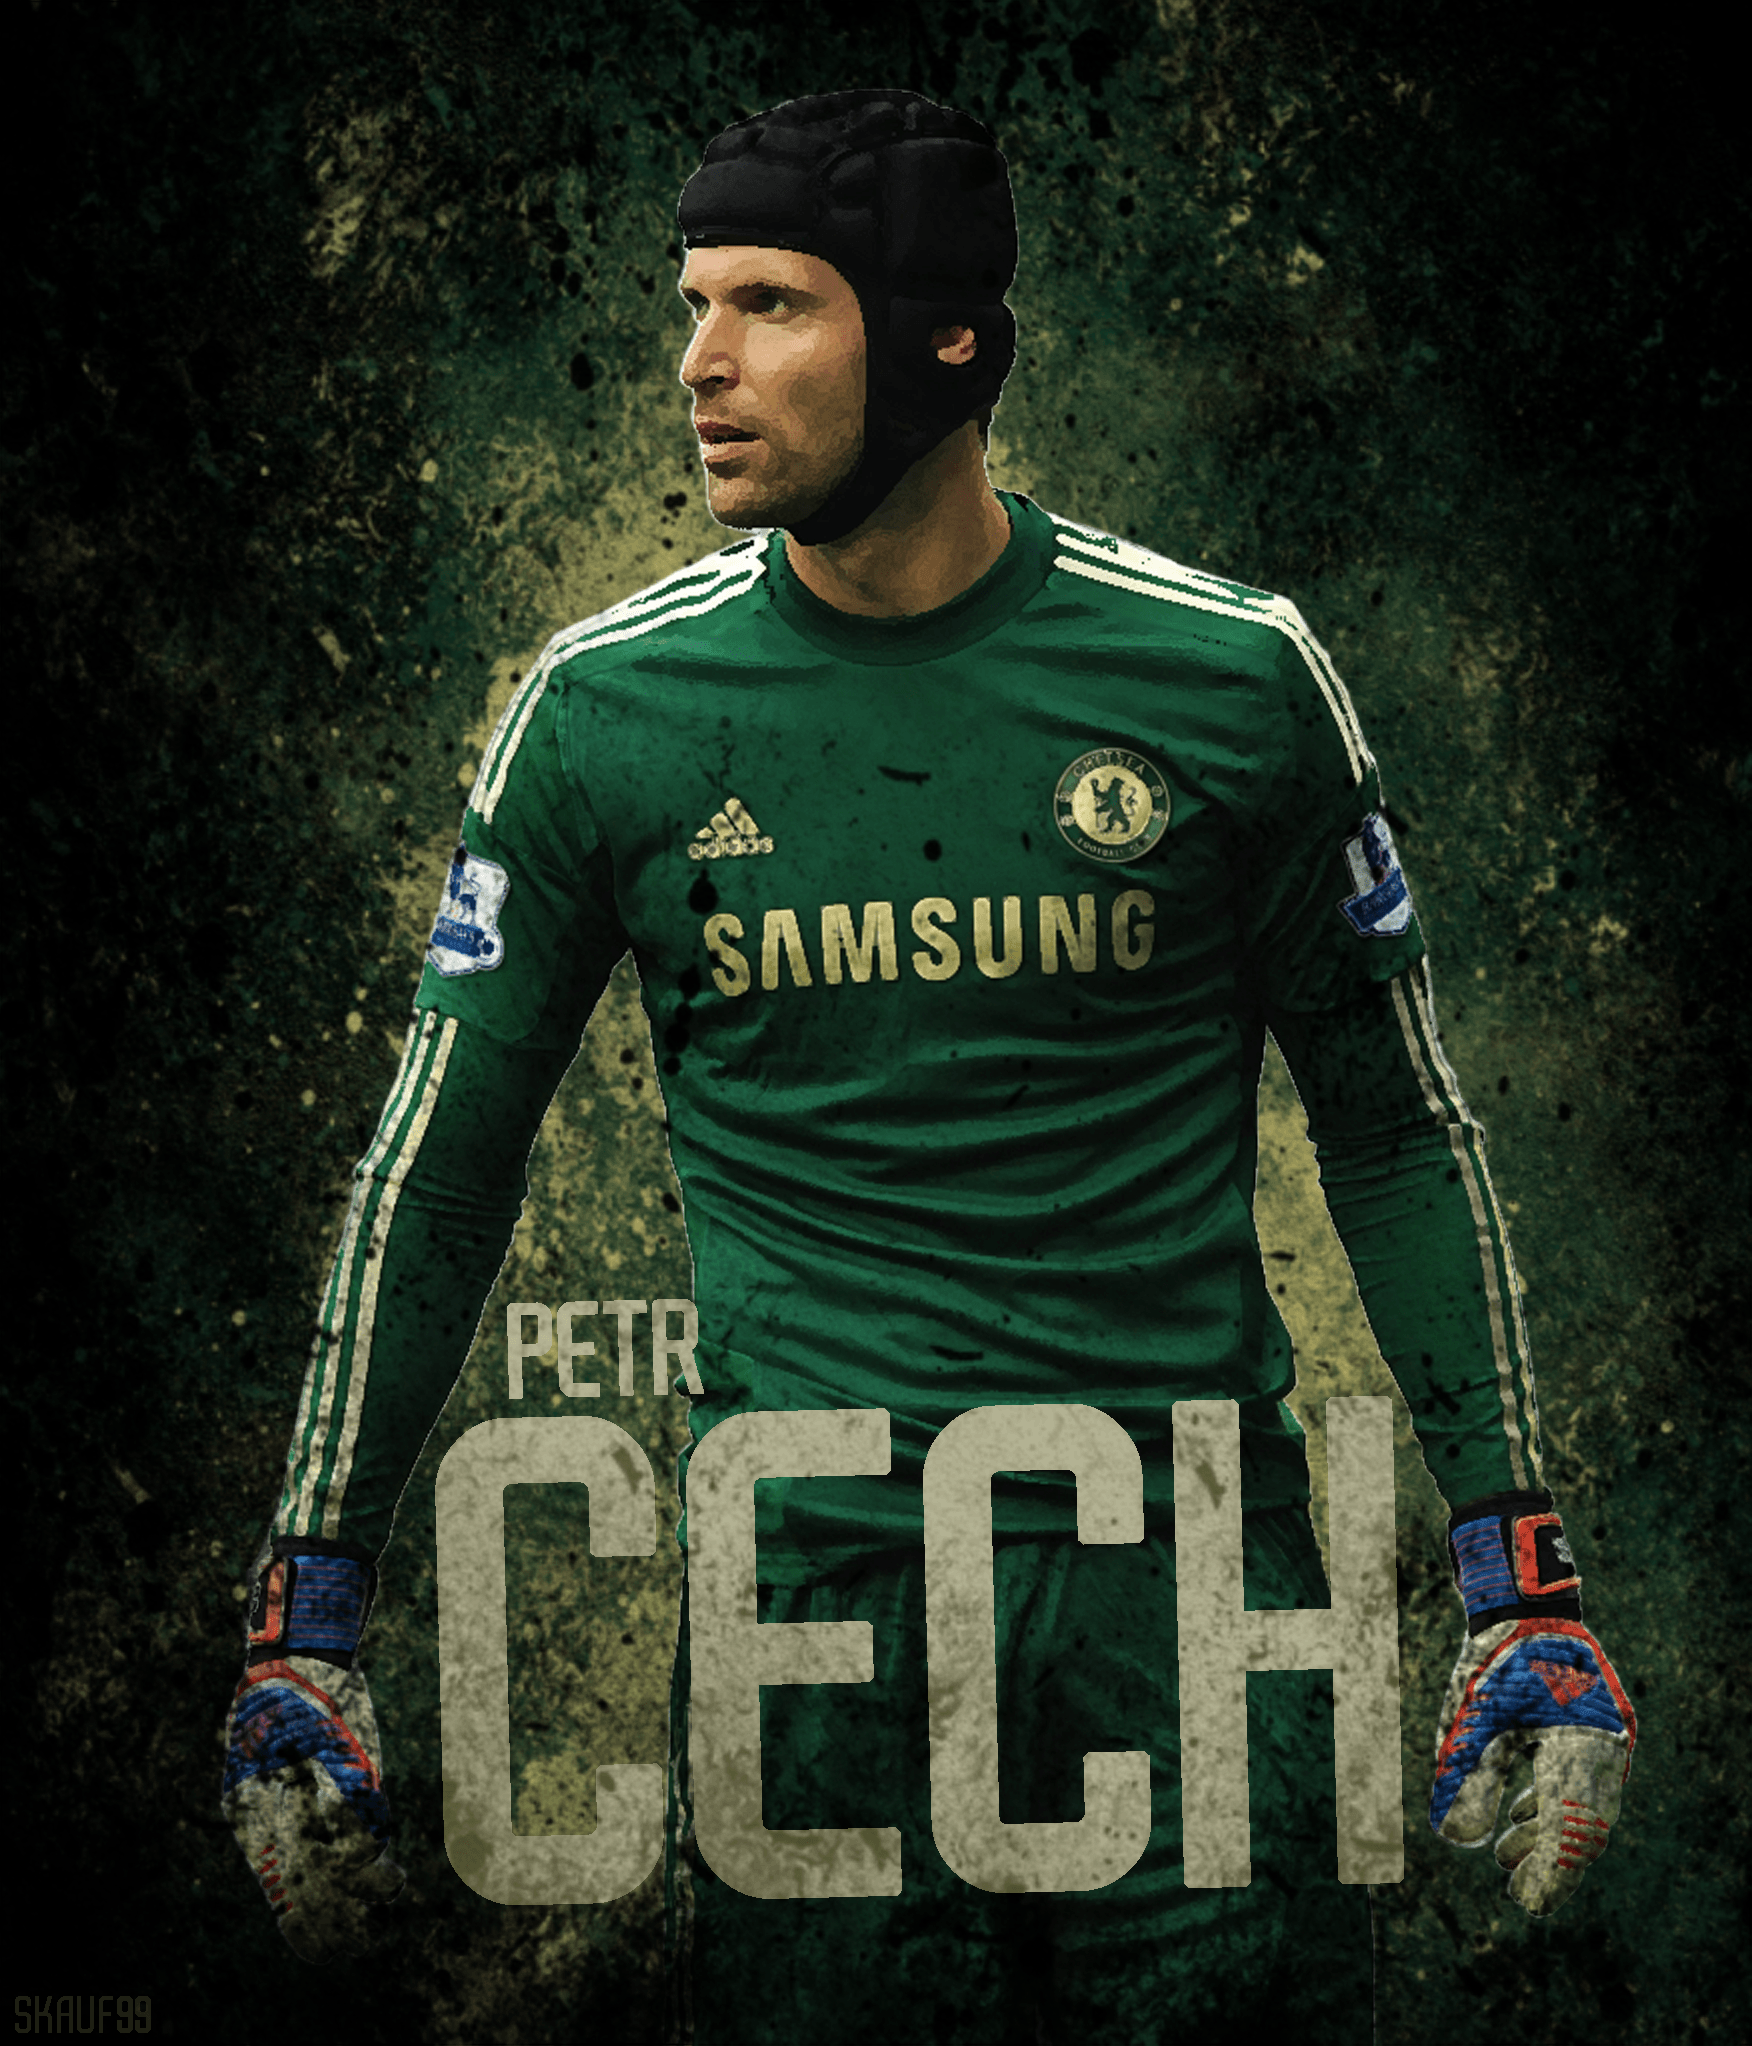 Petr Cech Hd Wallpapers 7wallpapers Net